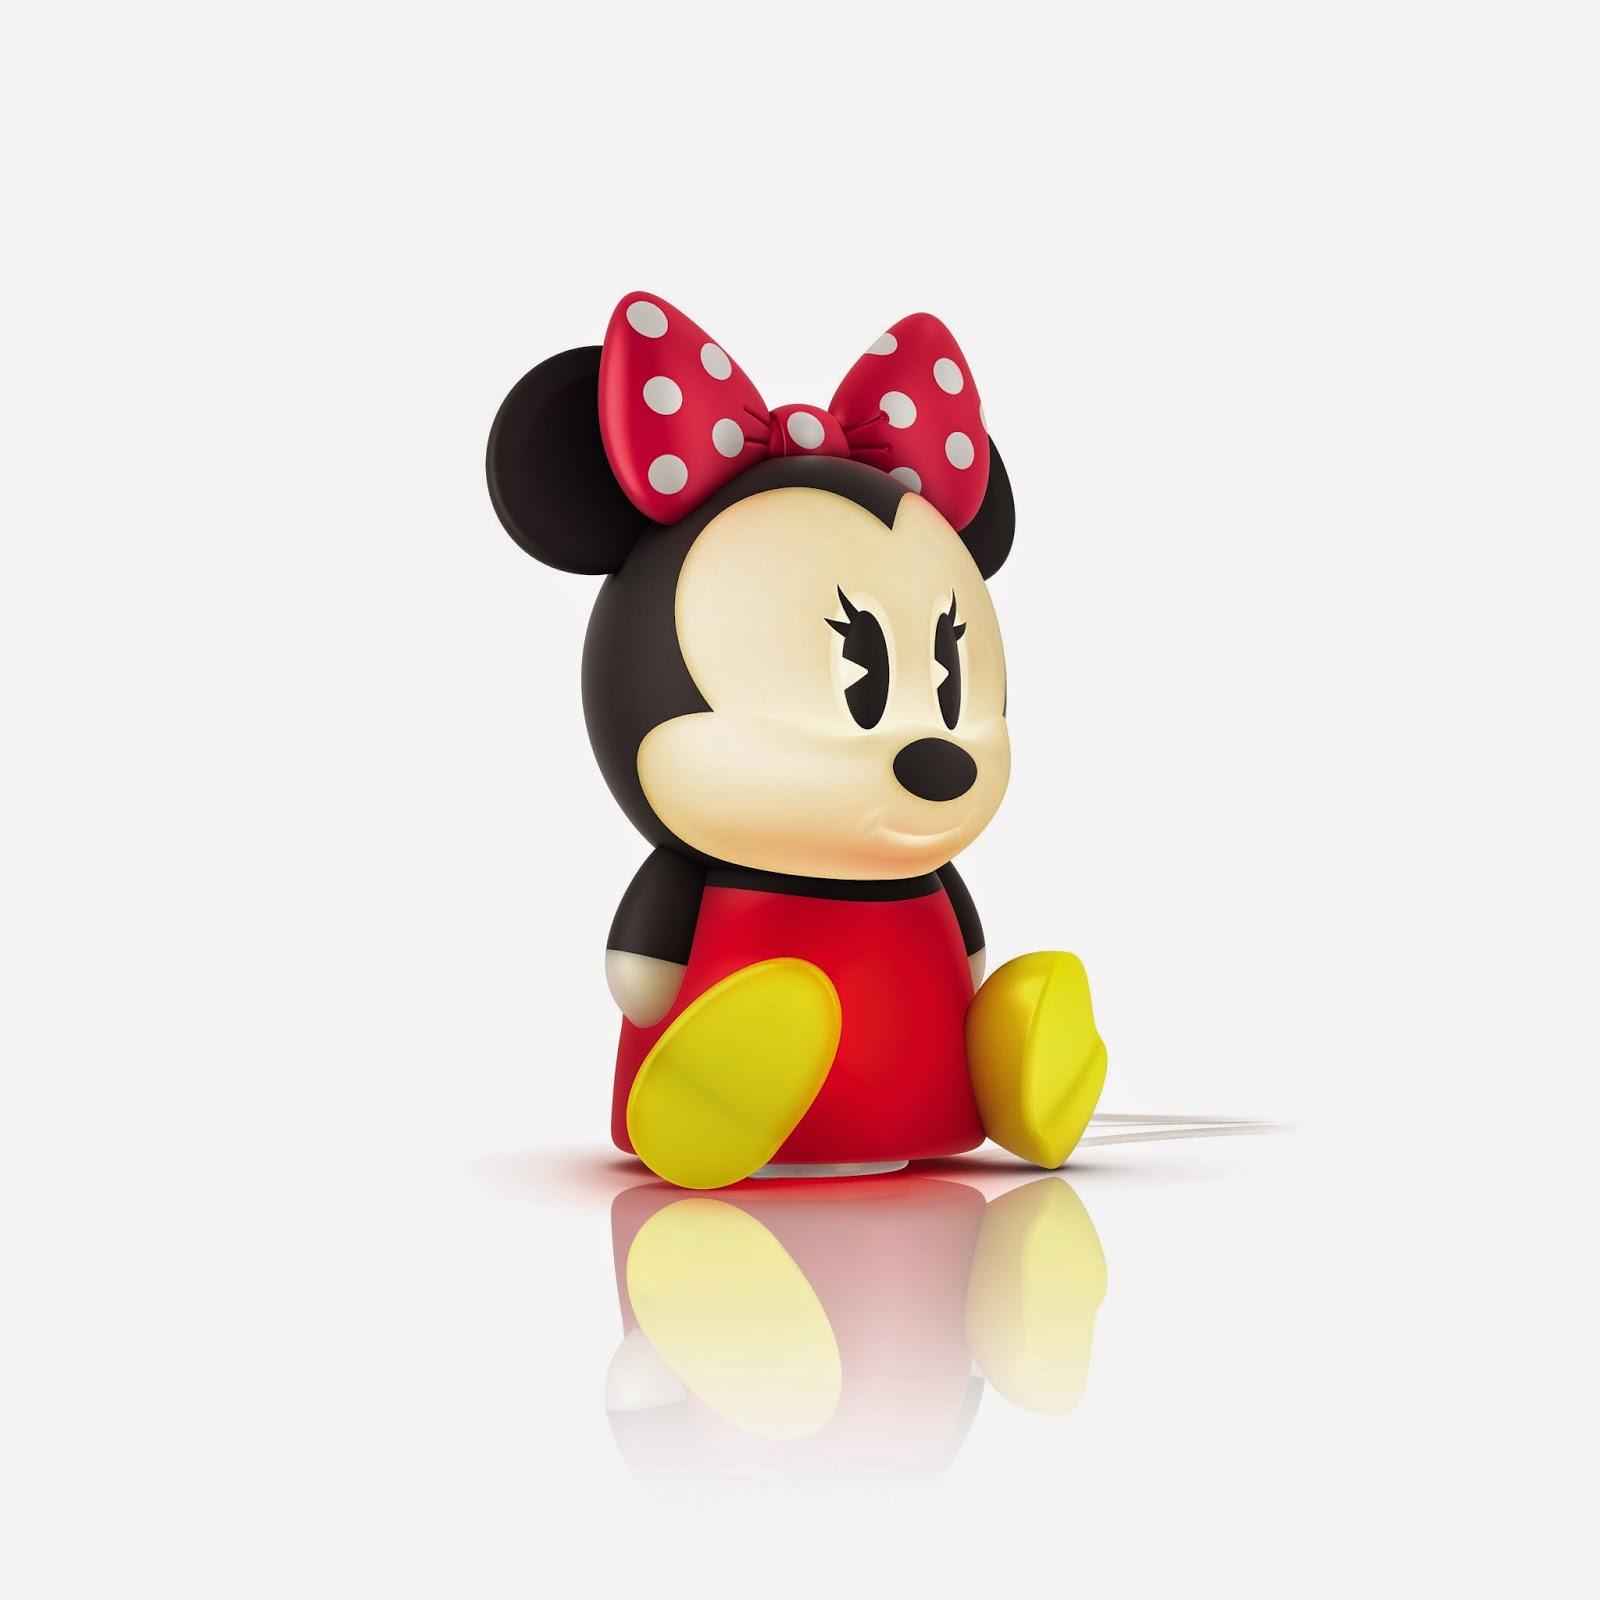 Halohalo22o: Philips And Disney Work Together To Light